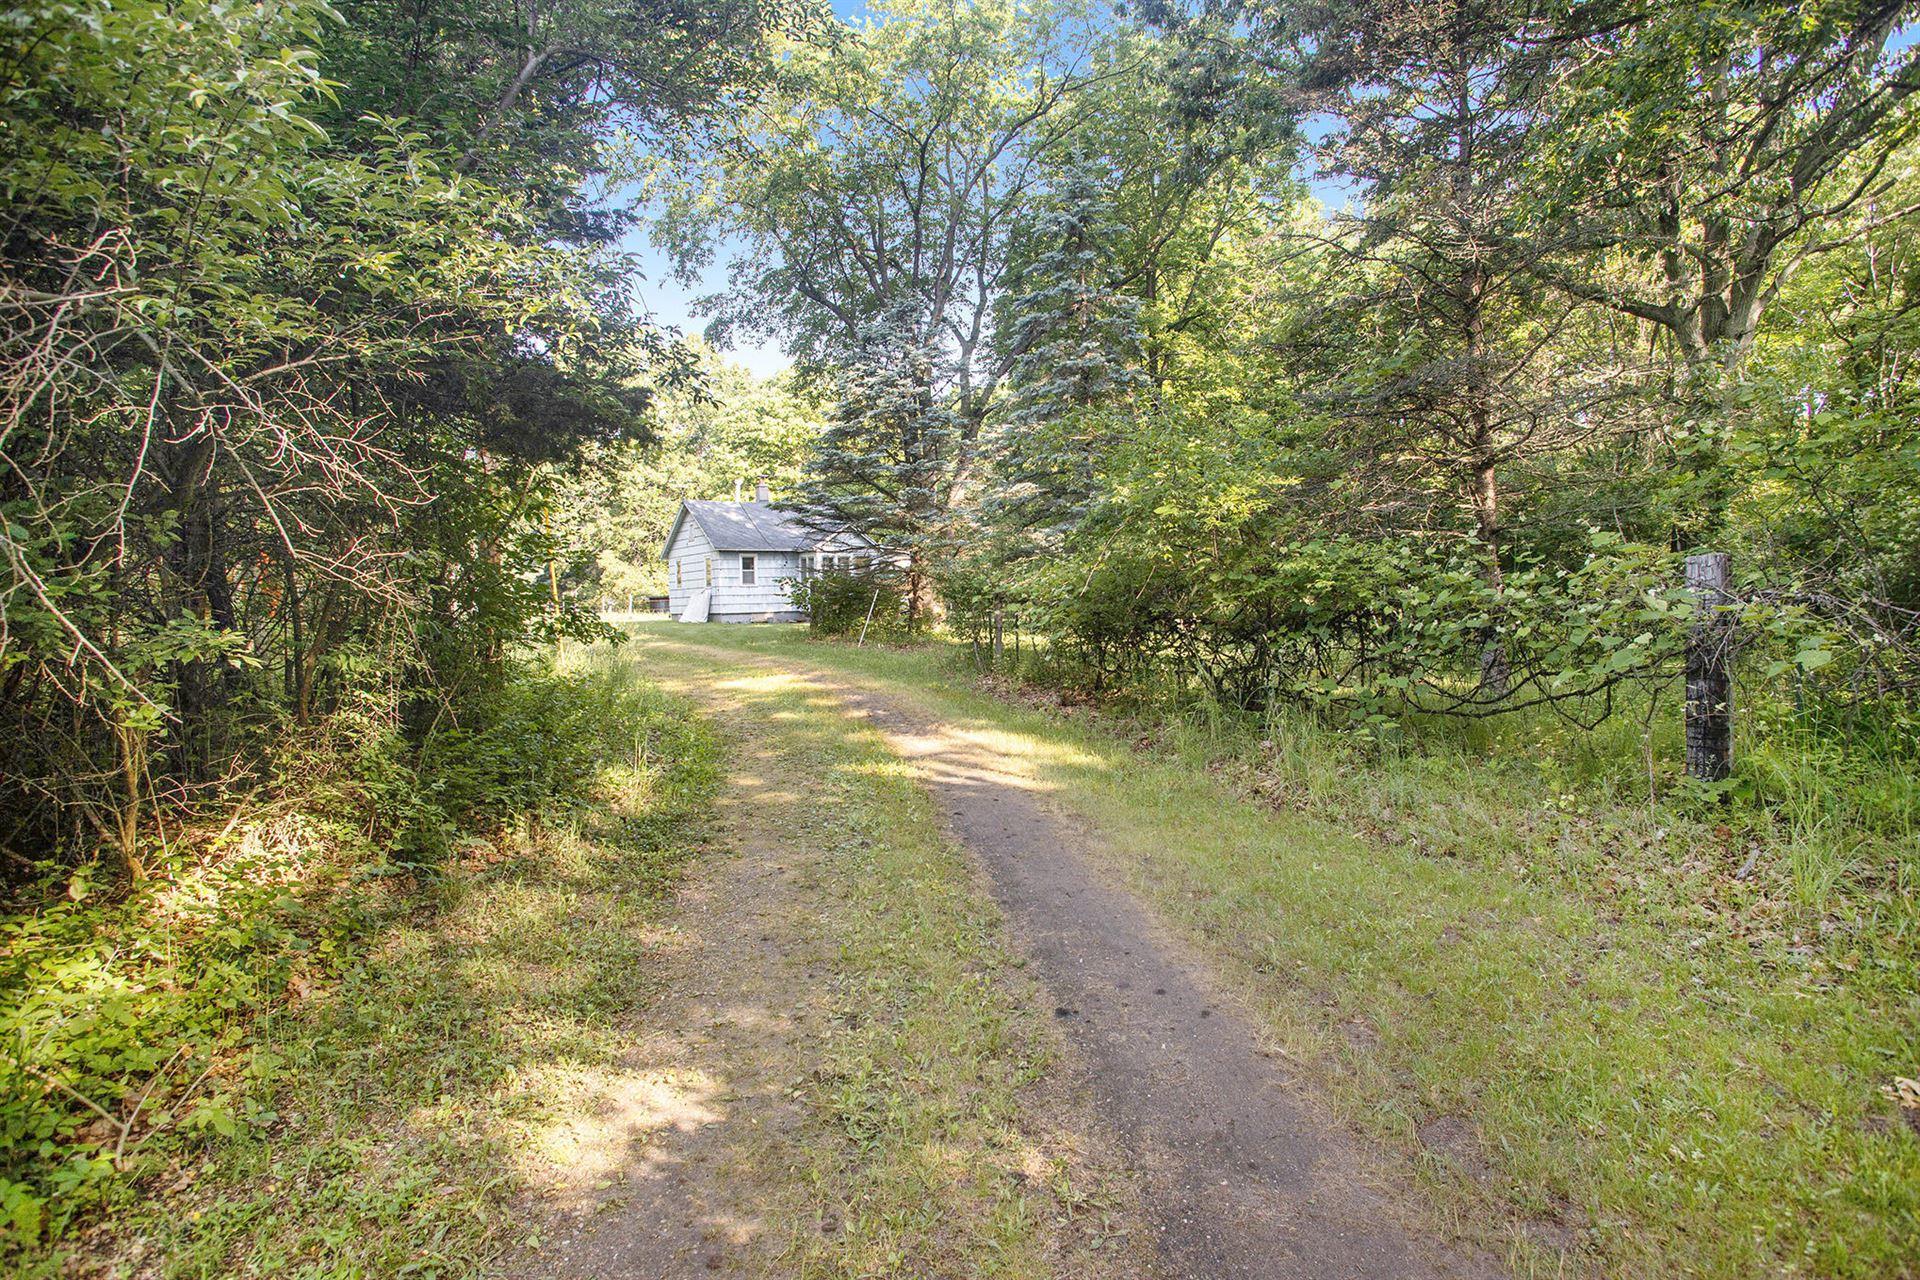 21421 Adams Road, Battle Creek, MI 49017 - MLS#: 21021831